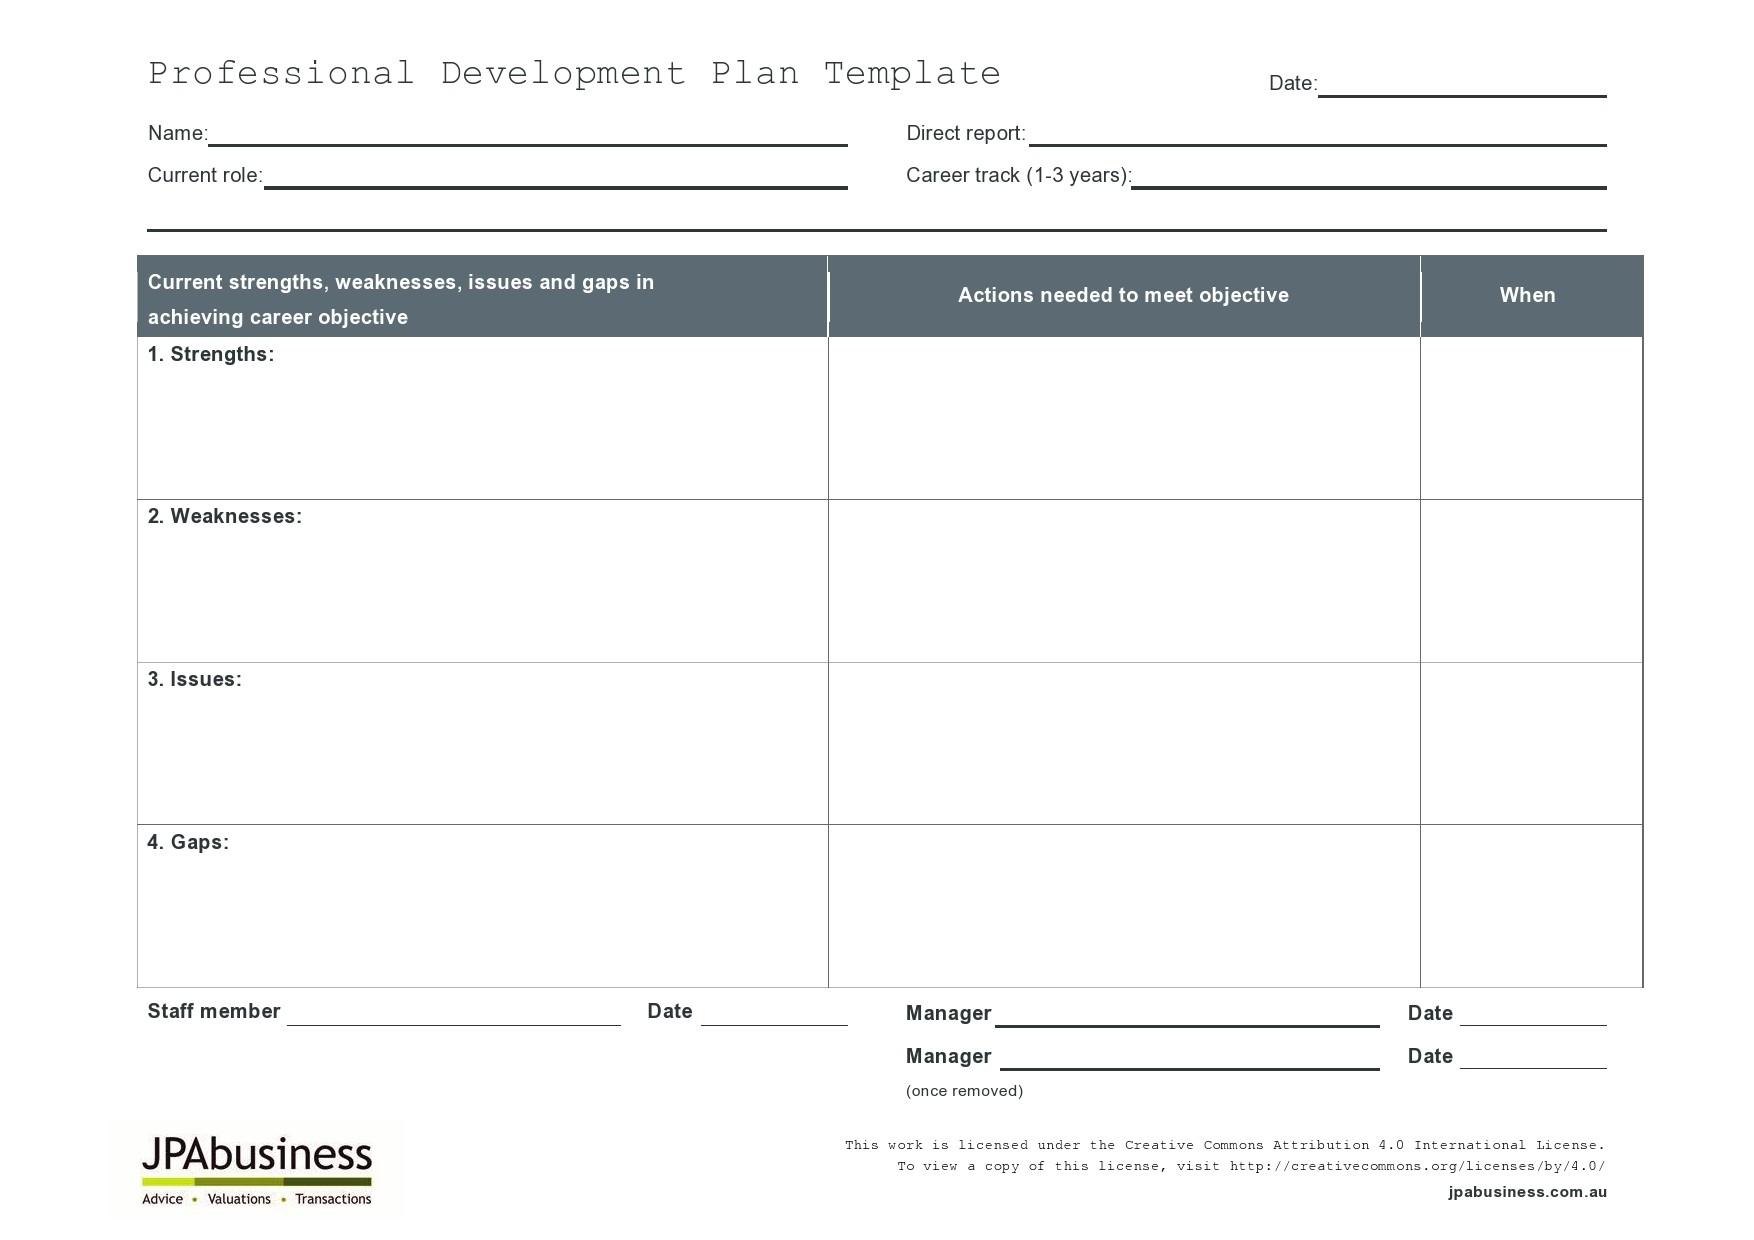 Free professional development plan 06